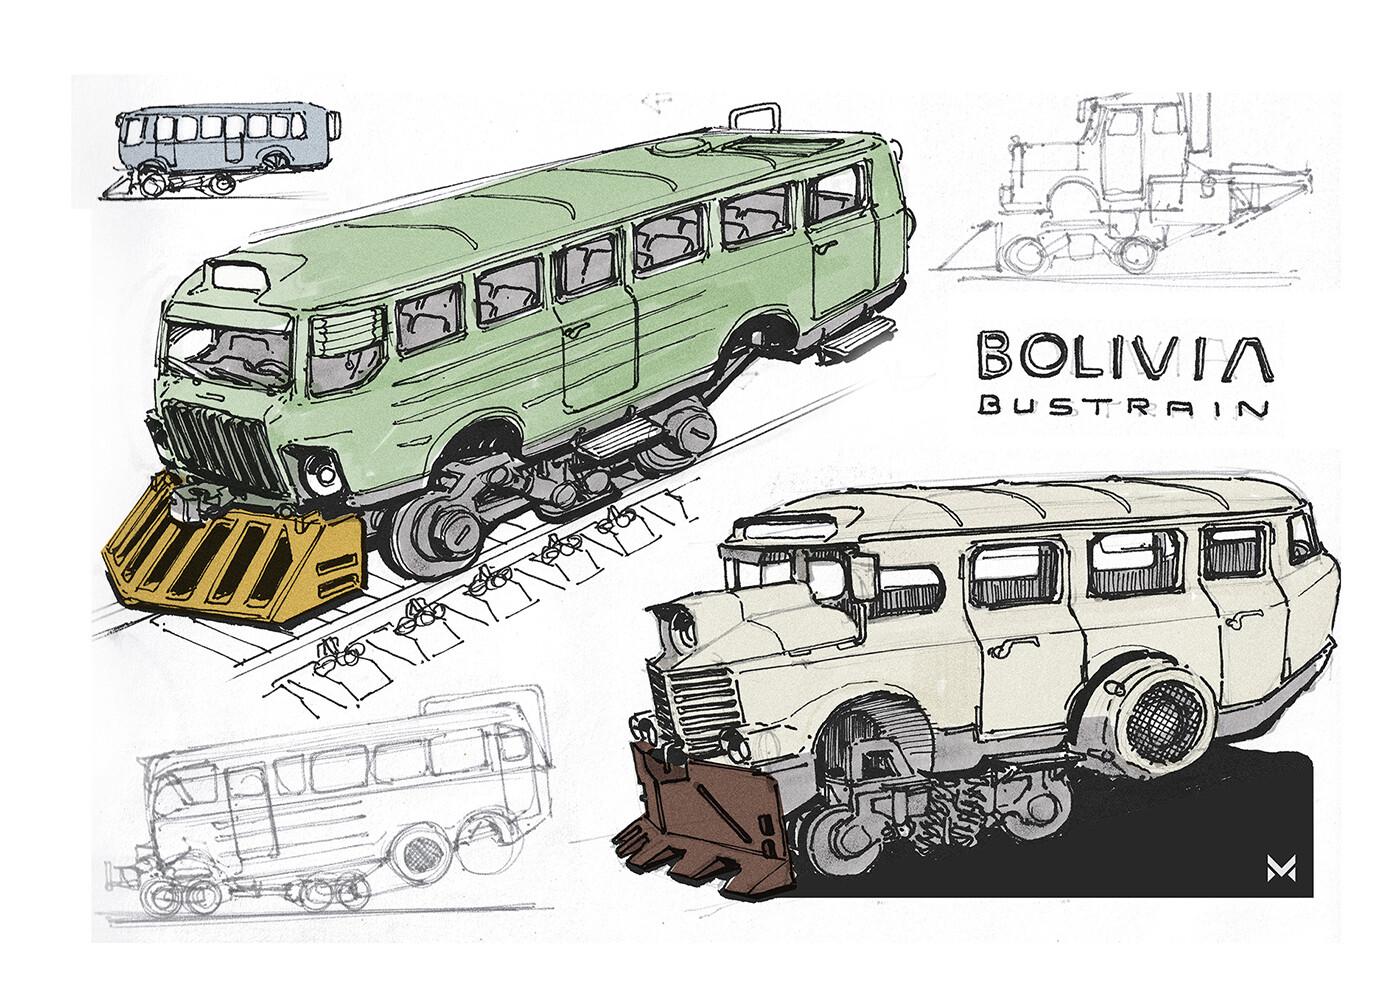 Railway-bus concept